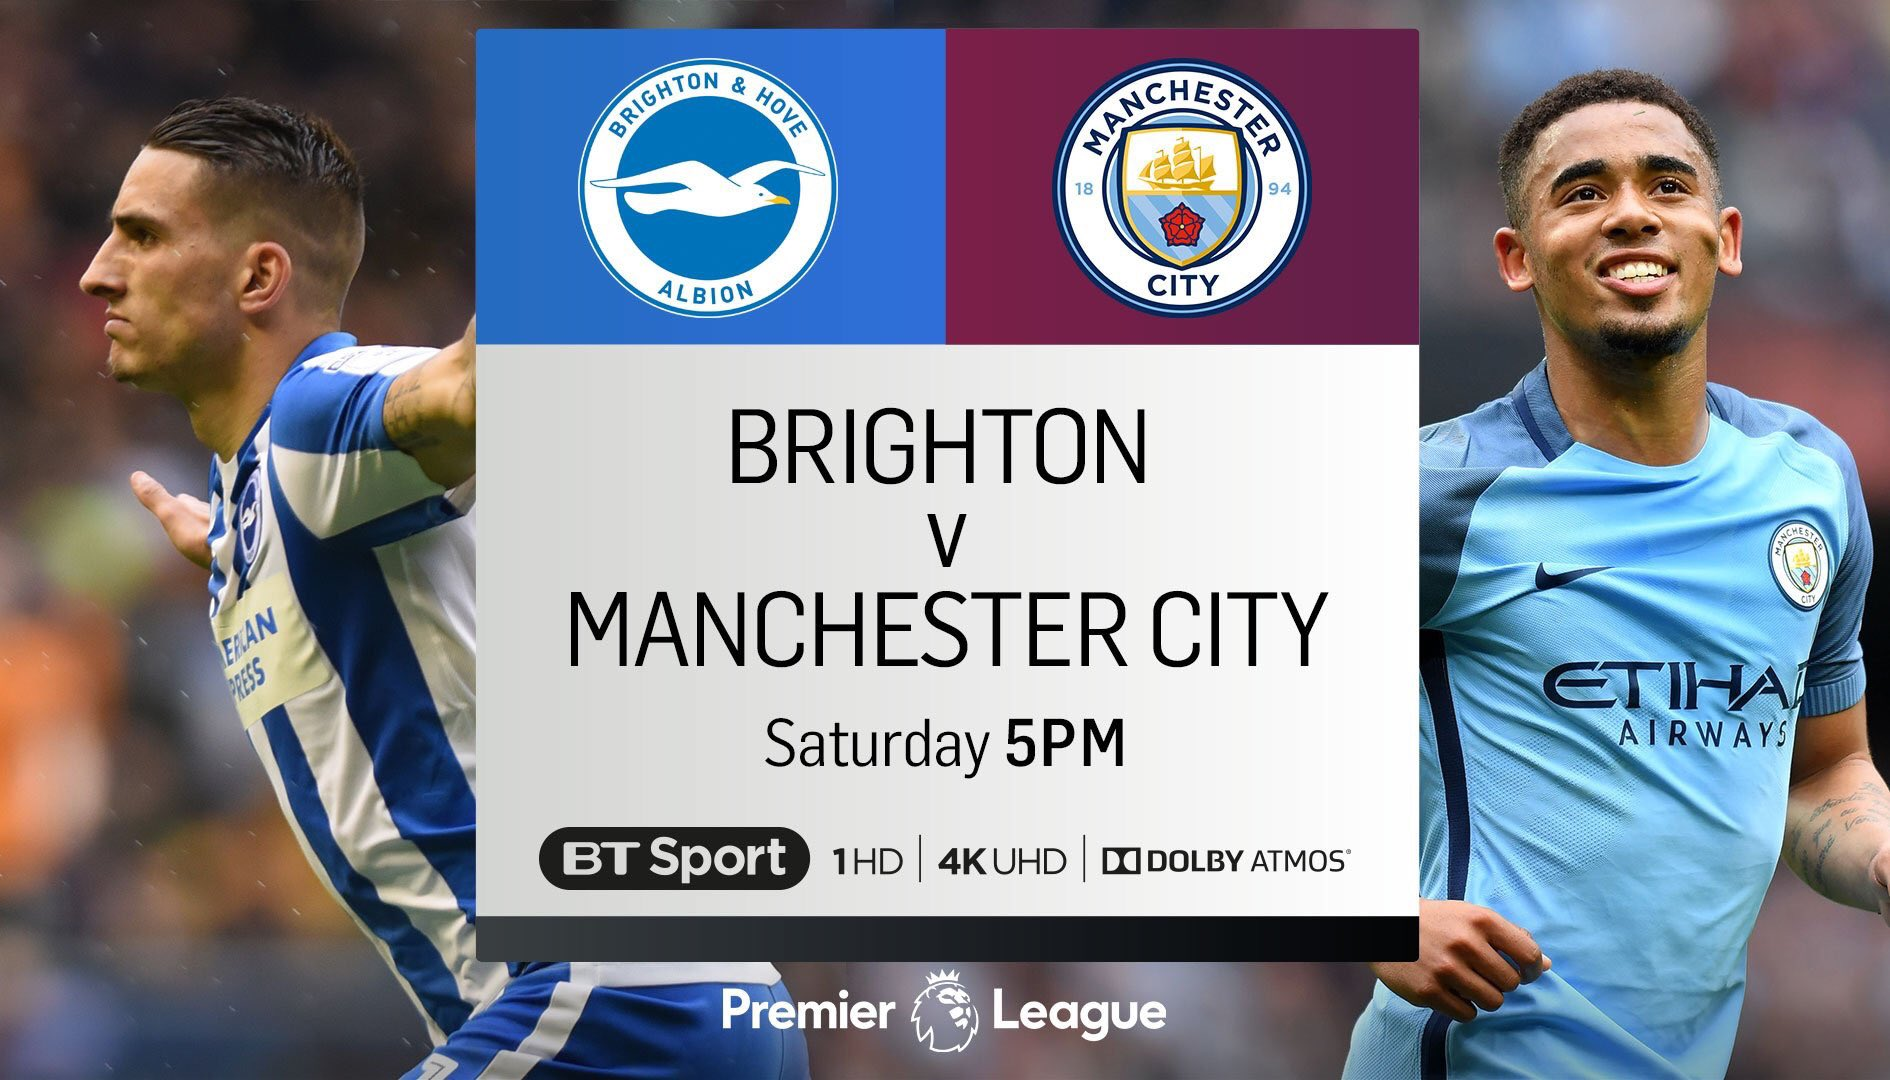 Title favourites✔️ Premier League newcomers✔️ Steven Gerrard✔️ Frank Lampard✔️ Live on @btsport ✔️ 5pm tonight✔️ https://t.co/a0SWYSuAgq